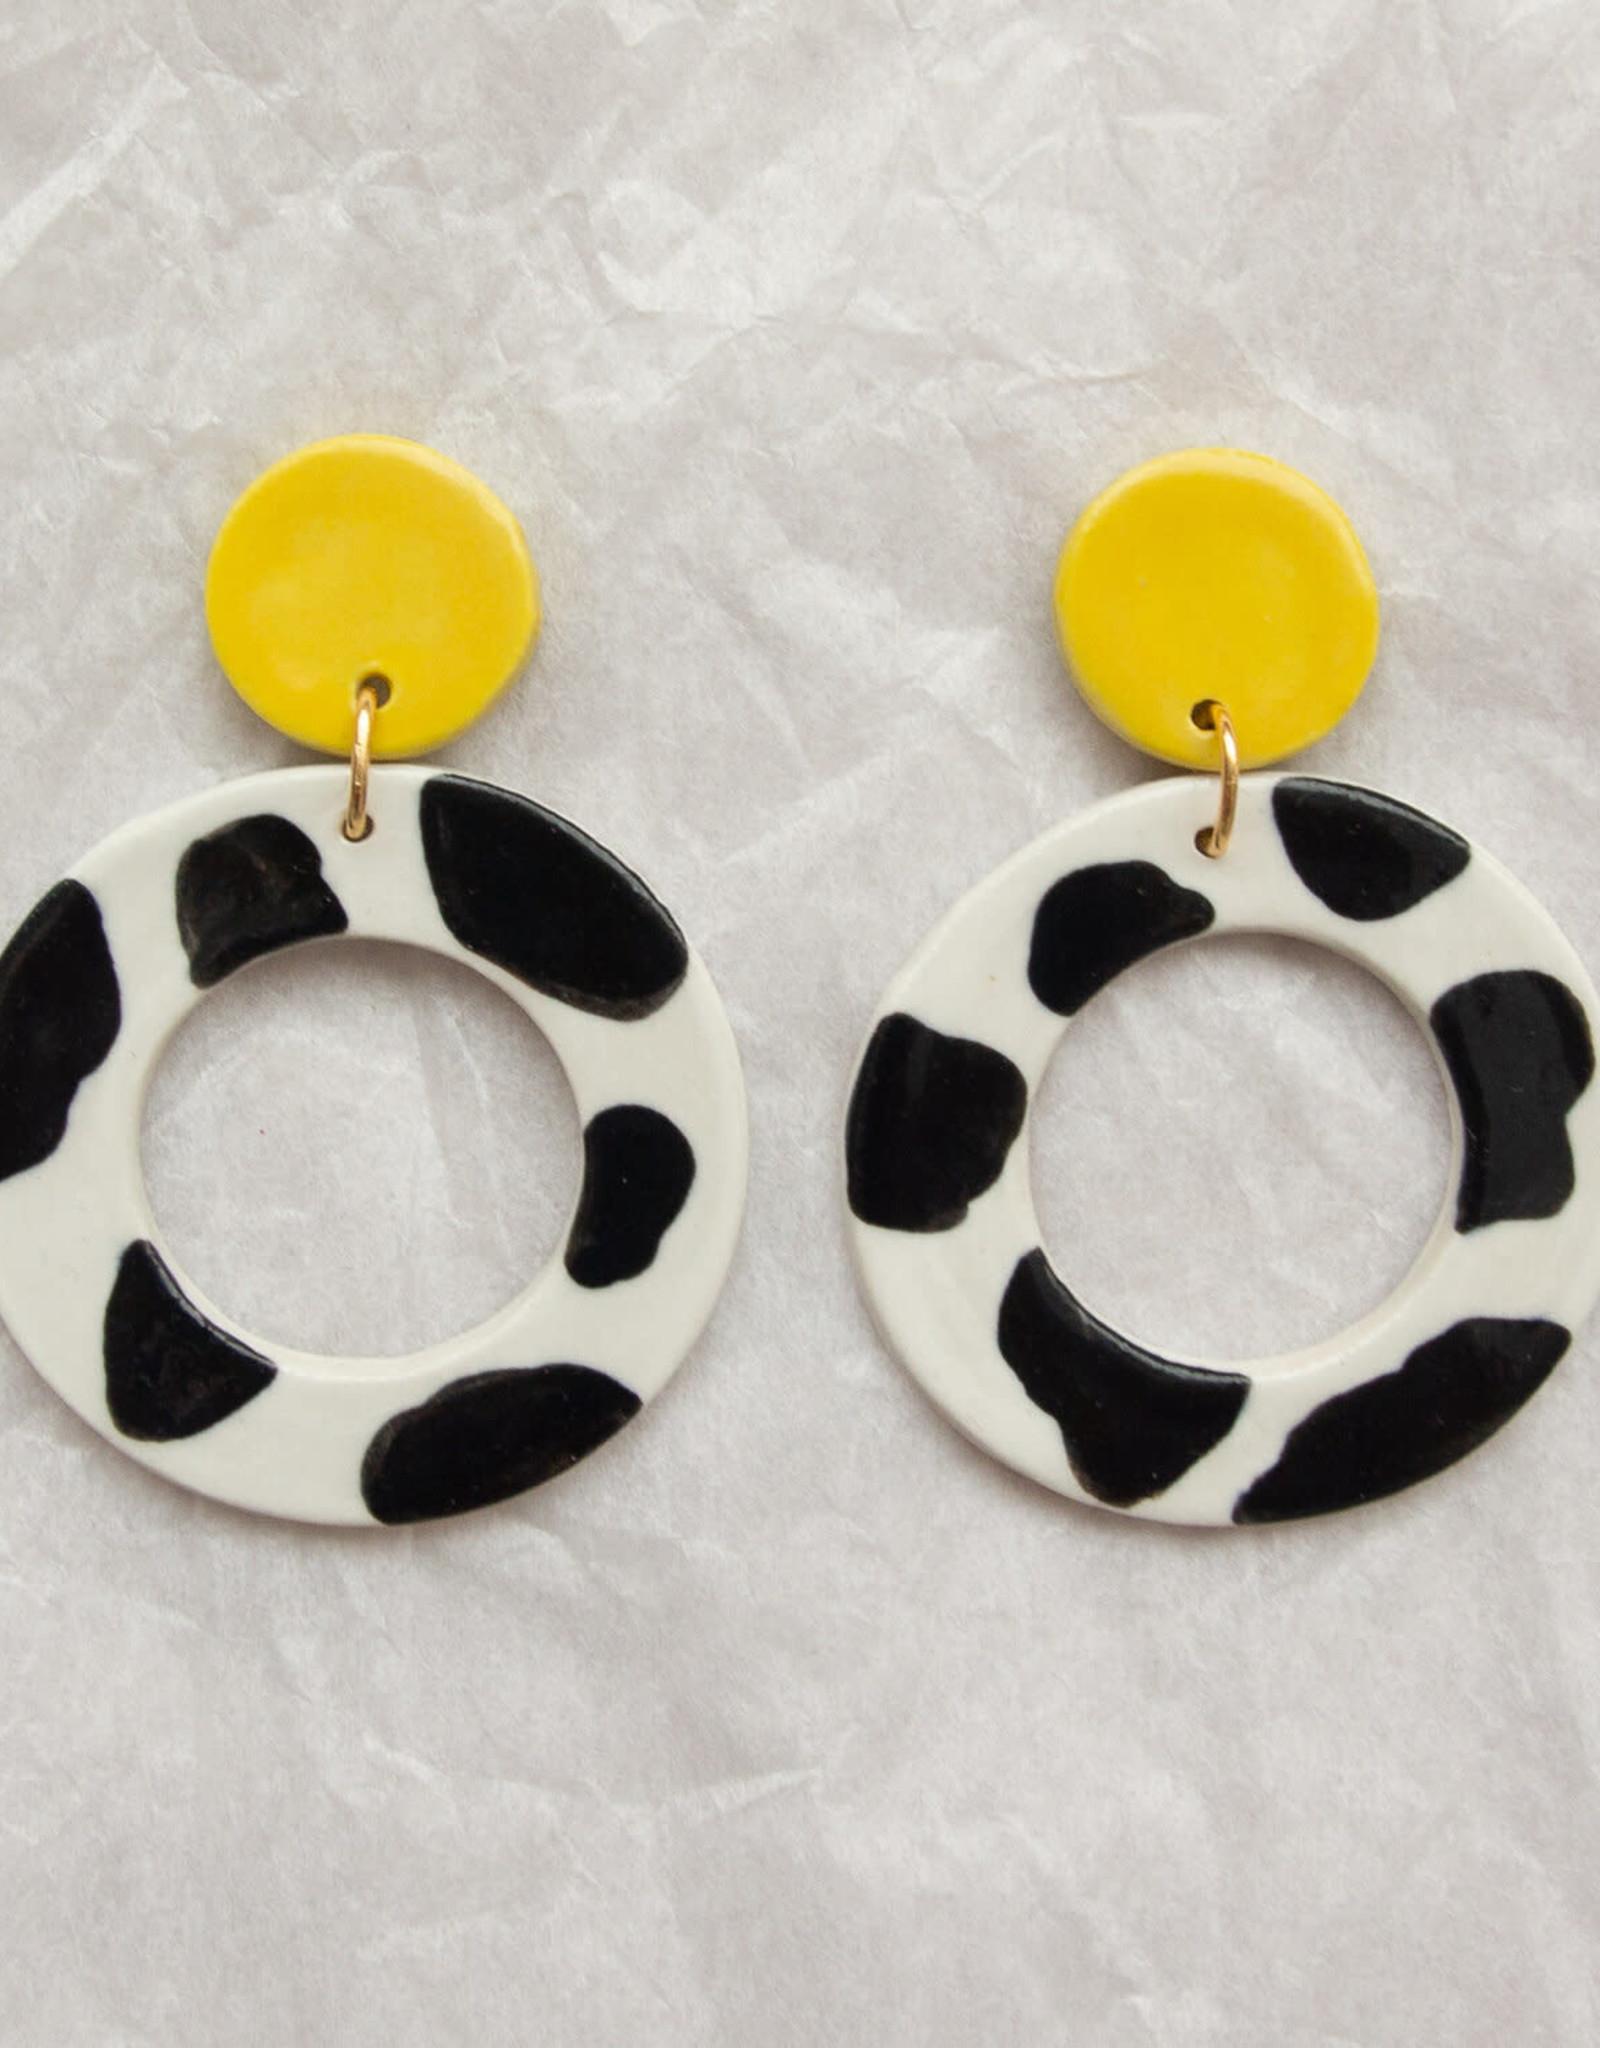 Meghan MacWhirter Dolly Ceramic Earrings - Assorted